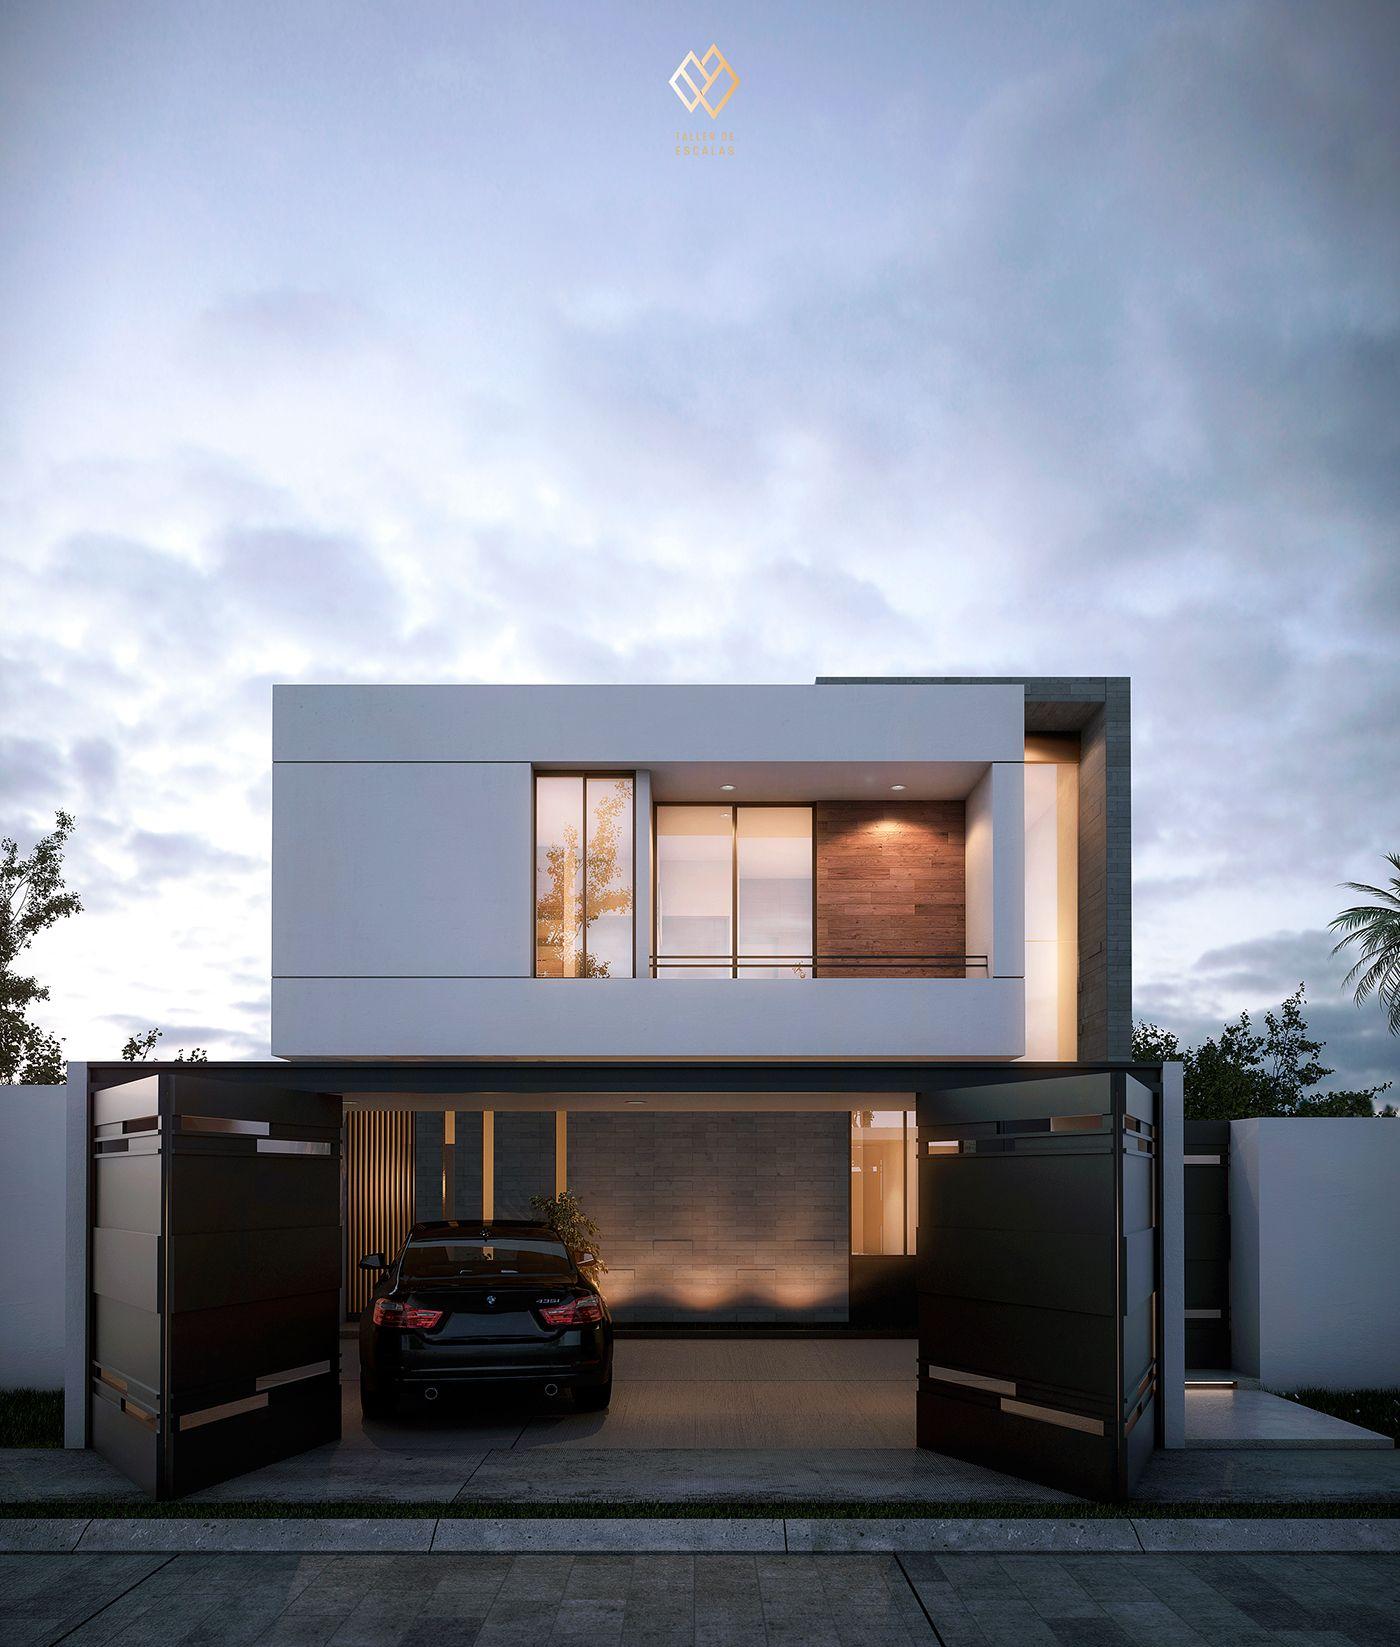 Proyecto residencial en colima m xico casa minimalista for Fachadas de casas nuevas modernas